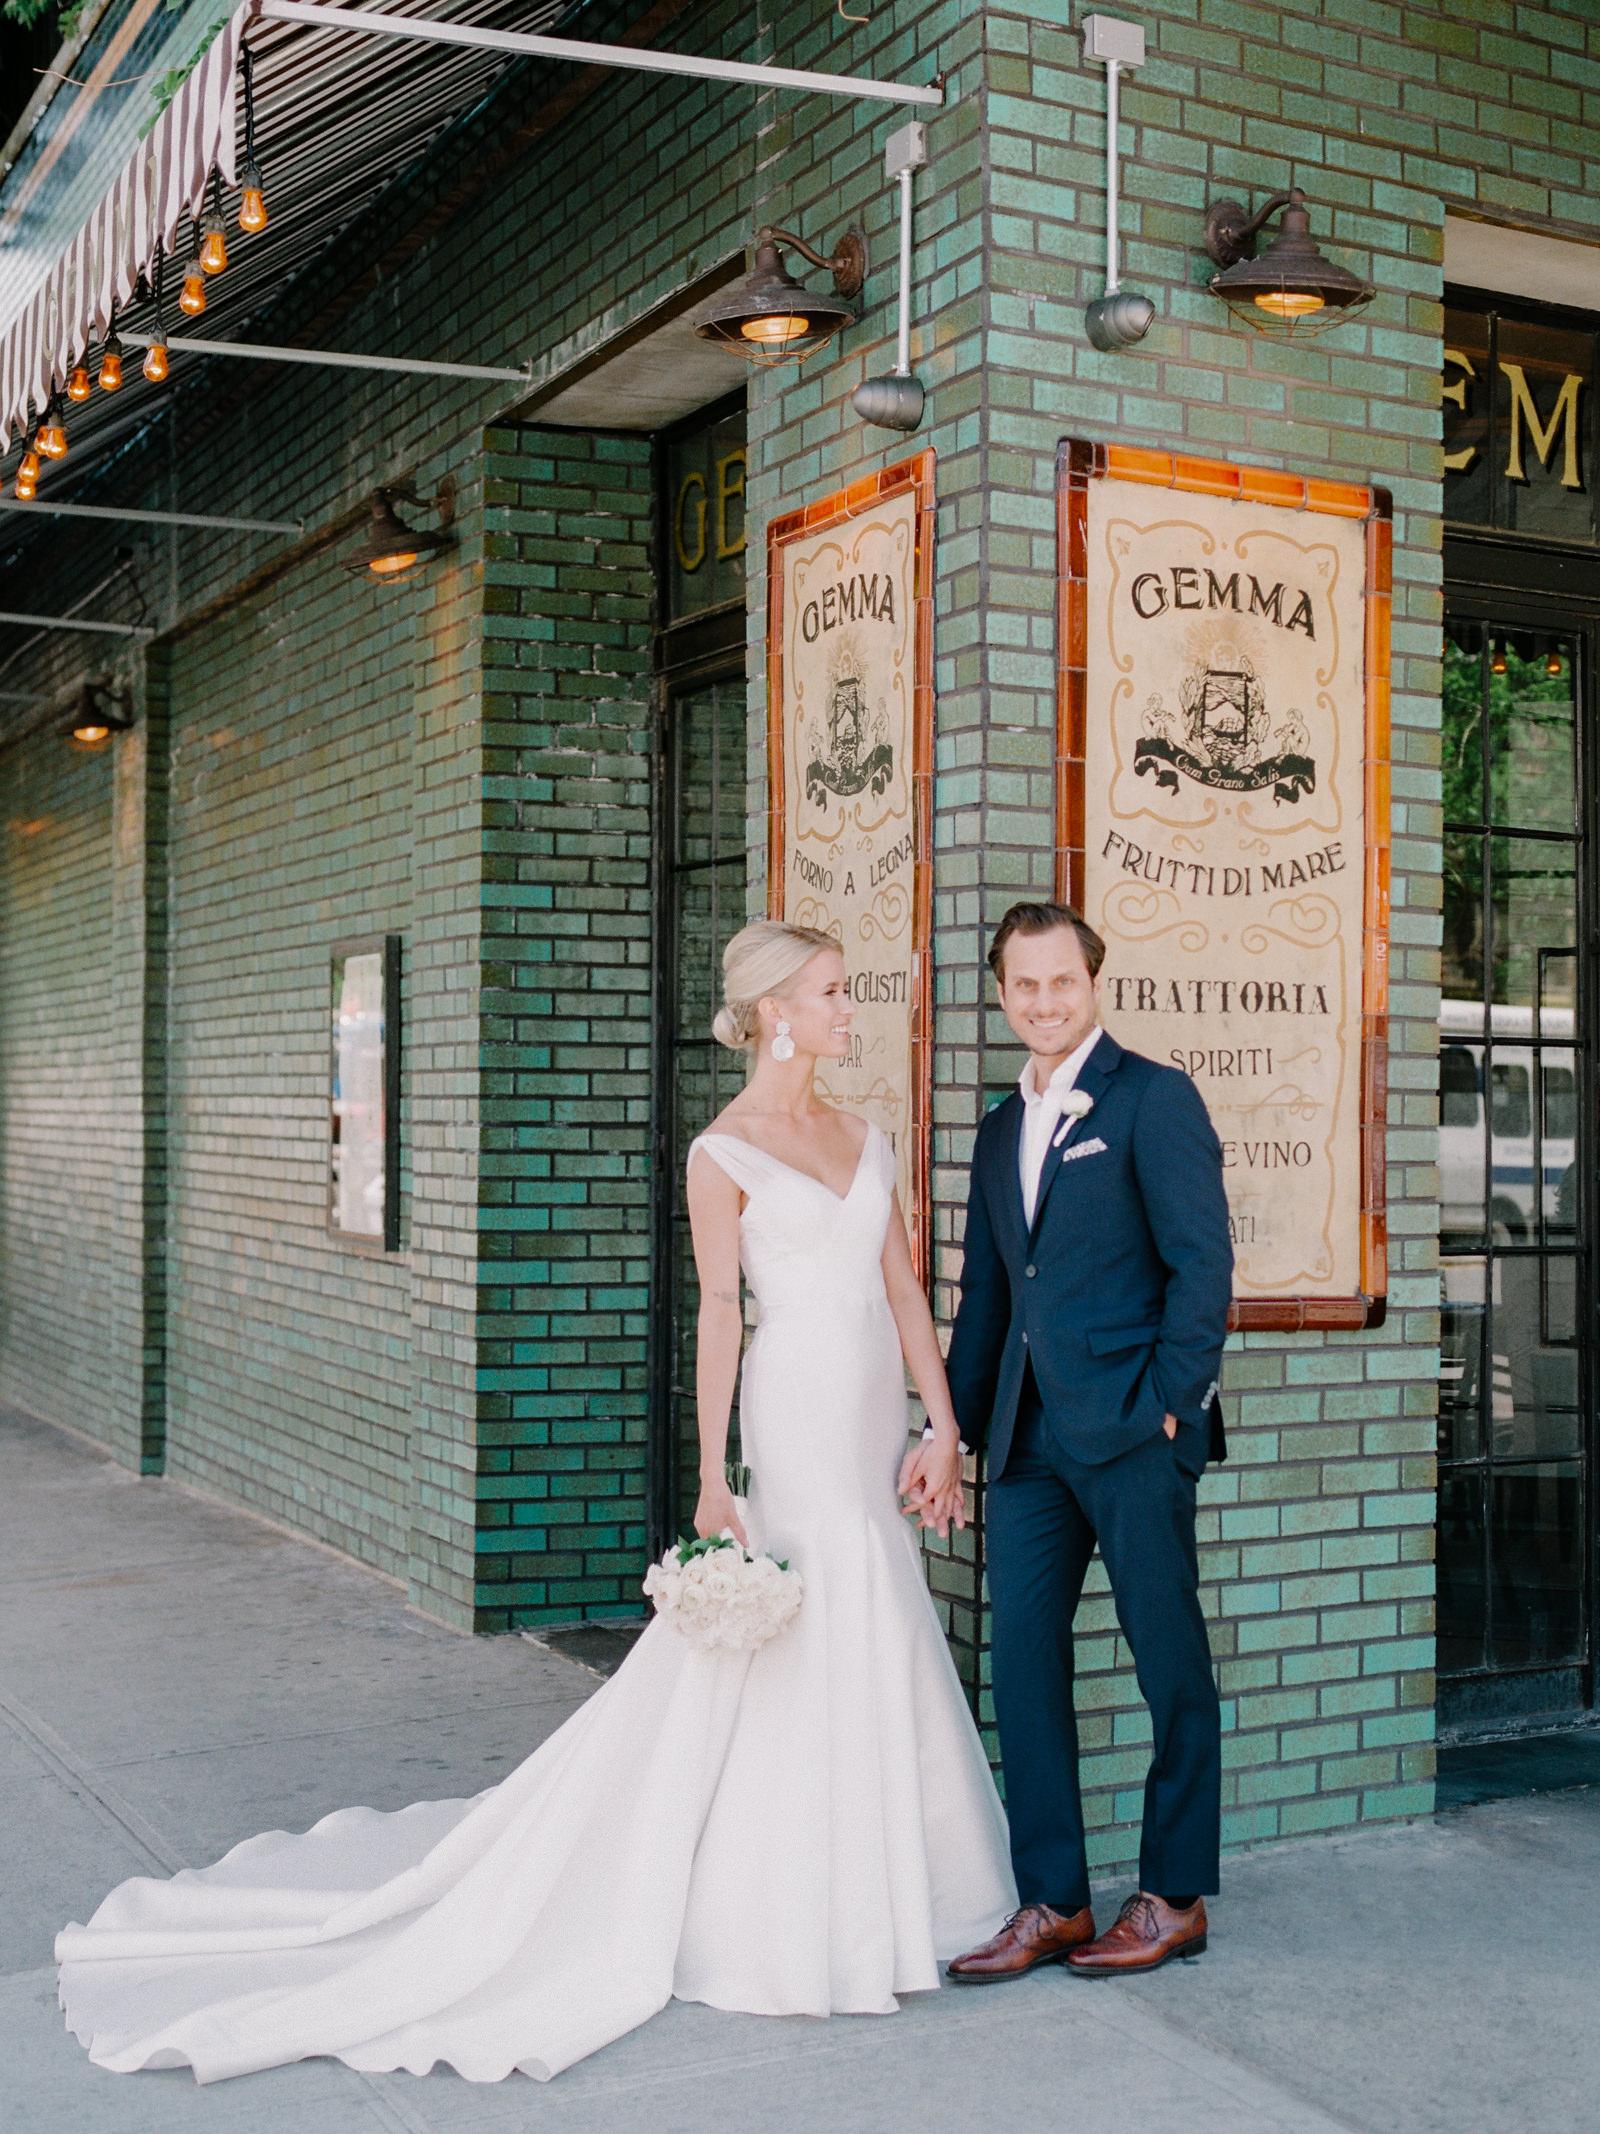 Intimate-NYC_wedding_ by Tanya Isaeva-92.jpg